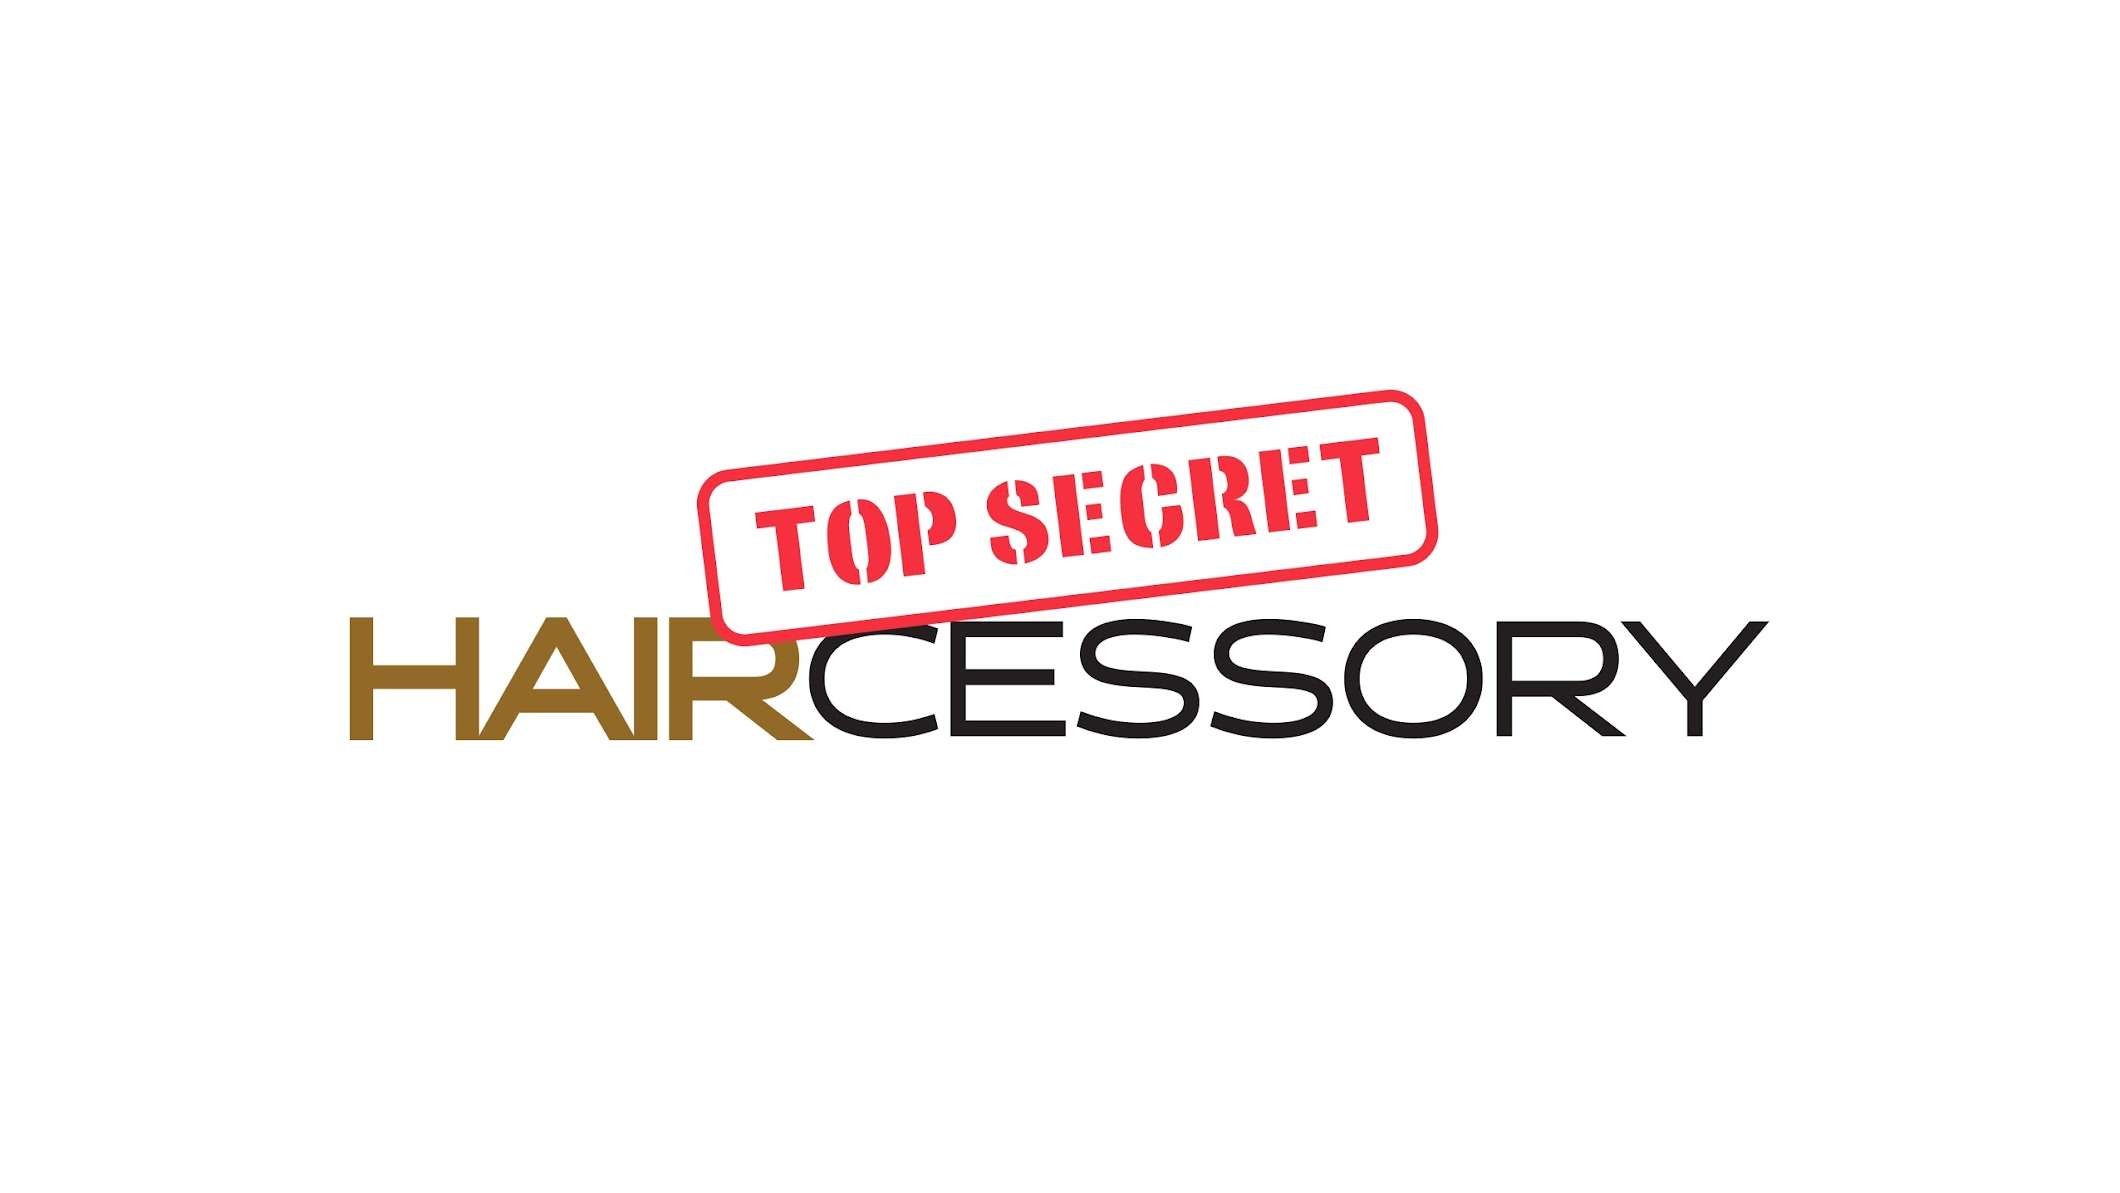 Top Secret Haircessory